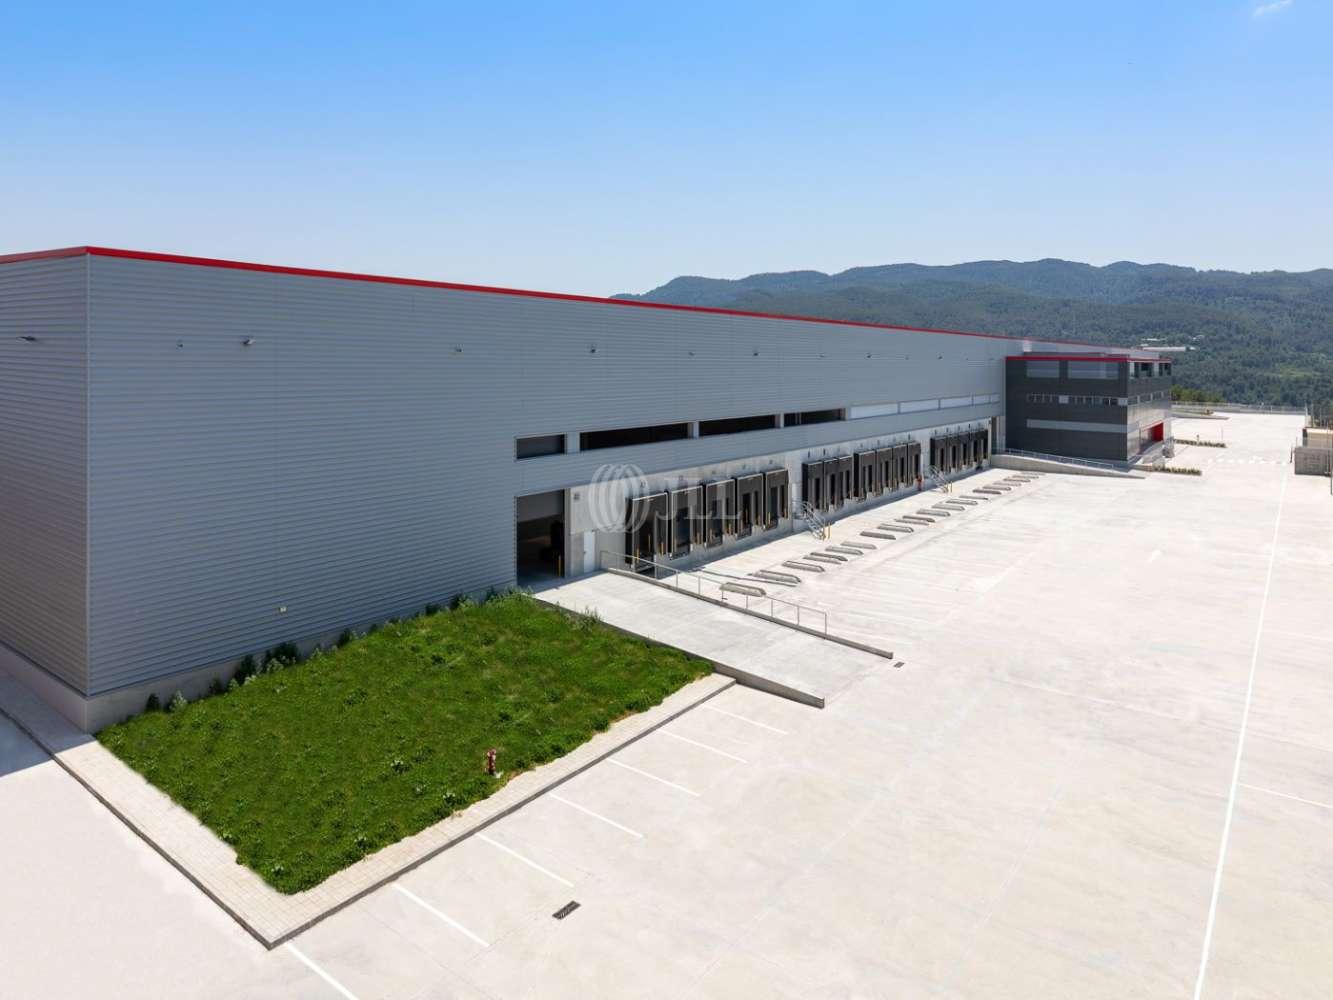 Naves industriales y logísticas Sant esteve sesrovires, 8635 - B0380 - PI CAN MARGARIT